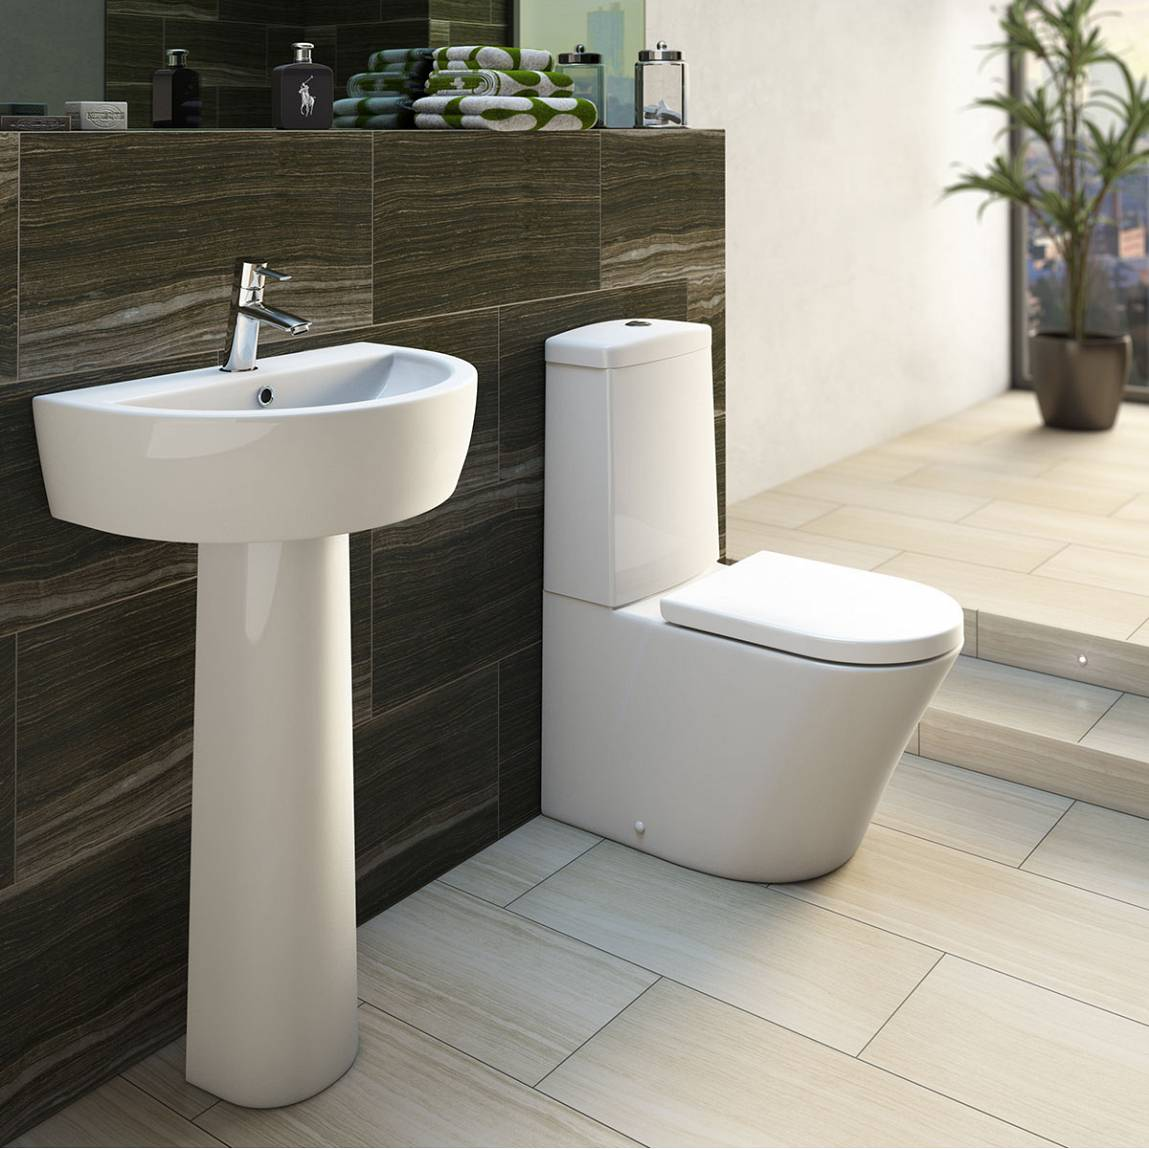 Arc Close Coupled Toilet inc. Quick Release Soft Close Seat